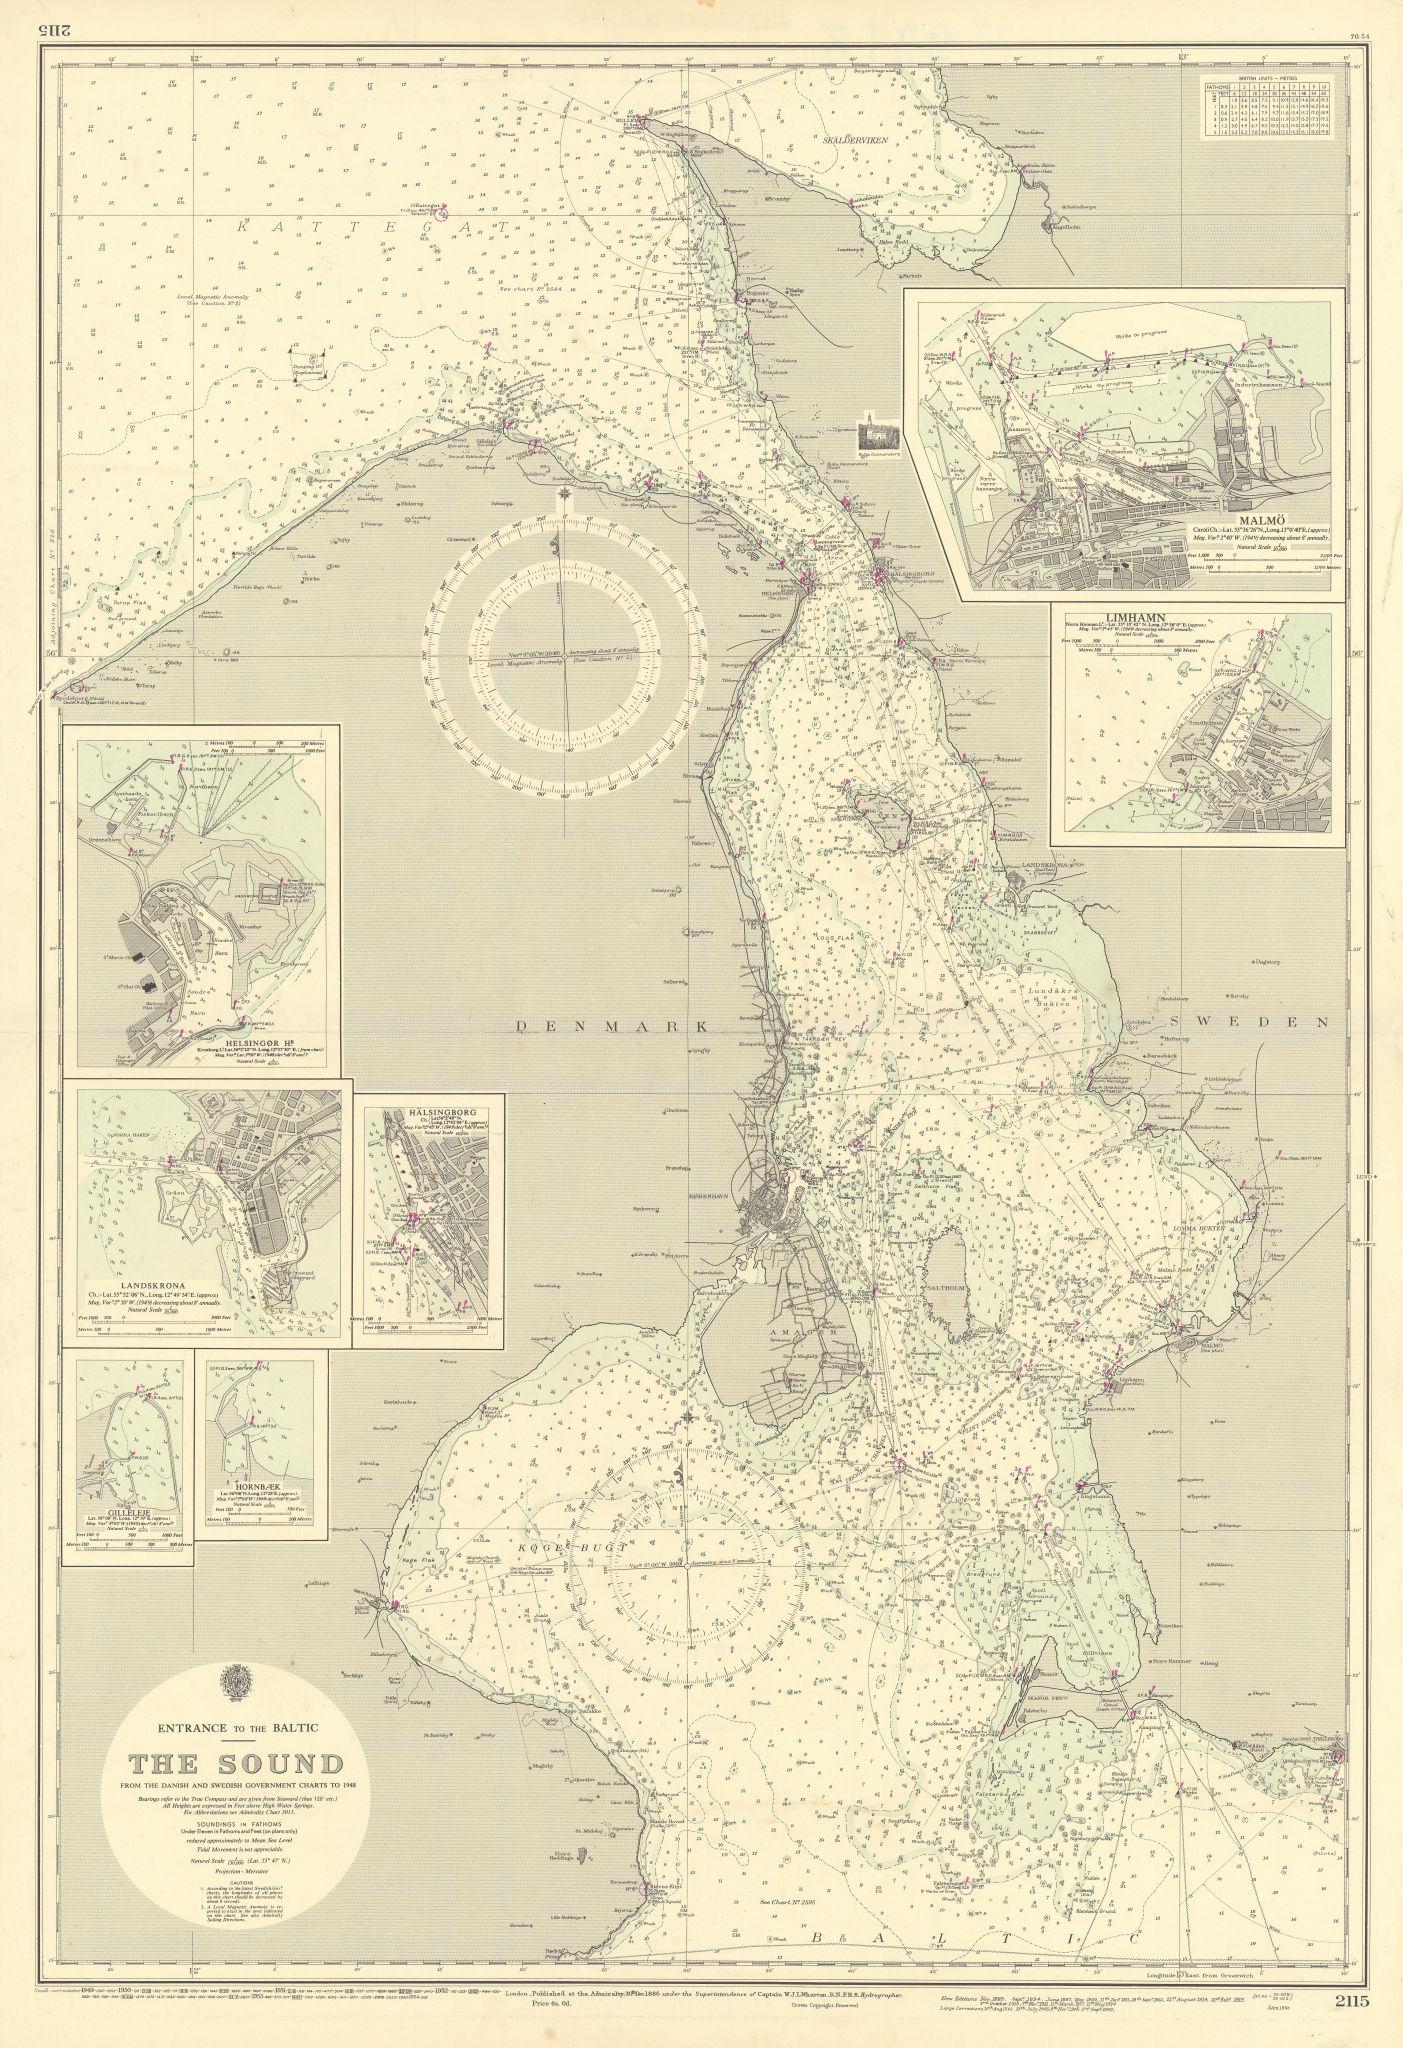 Oresund ports Baltic Malmӧ Copenhagen ADMIRALTY sea chart 1886 (1954) old map